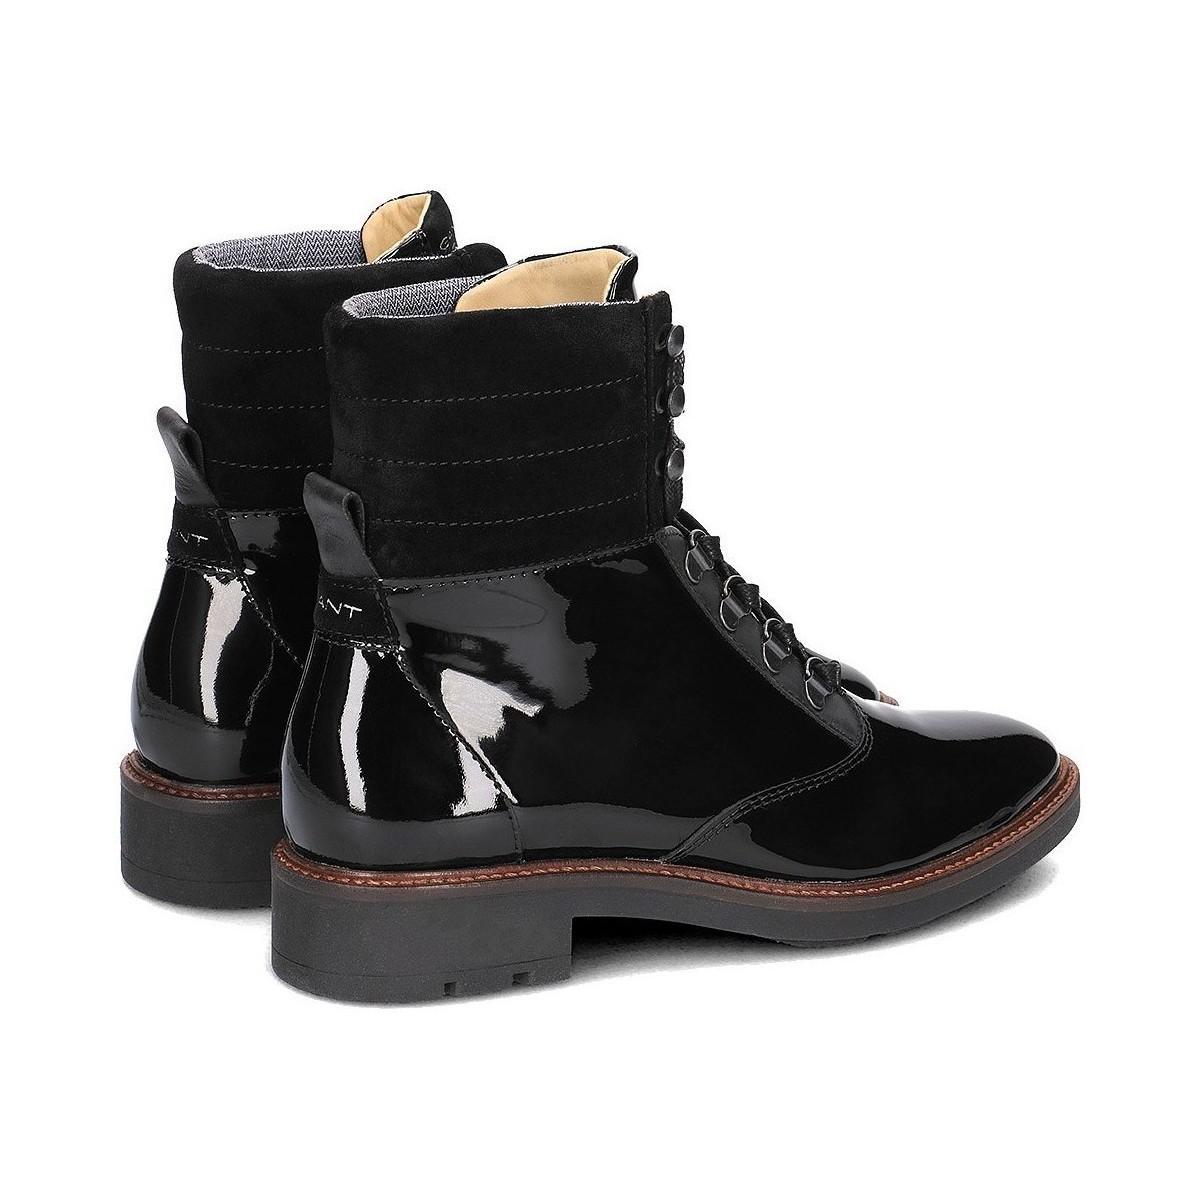 GANT Emilia Women's Mid Boots In Black